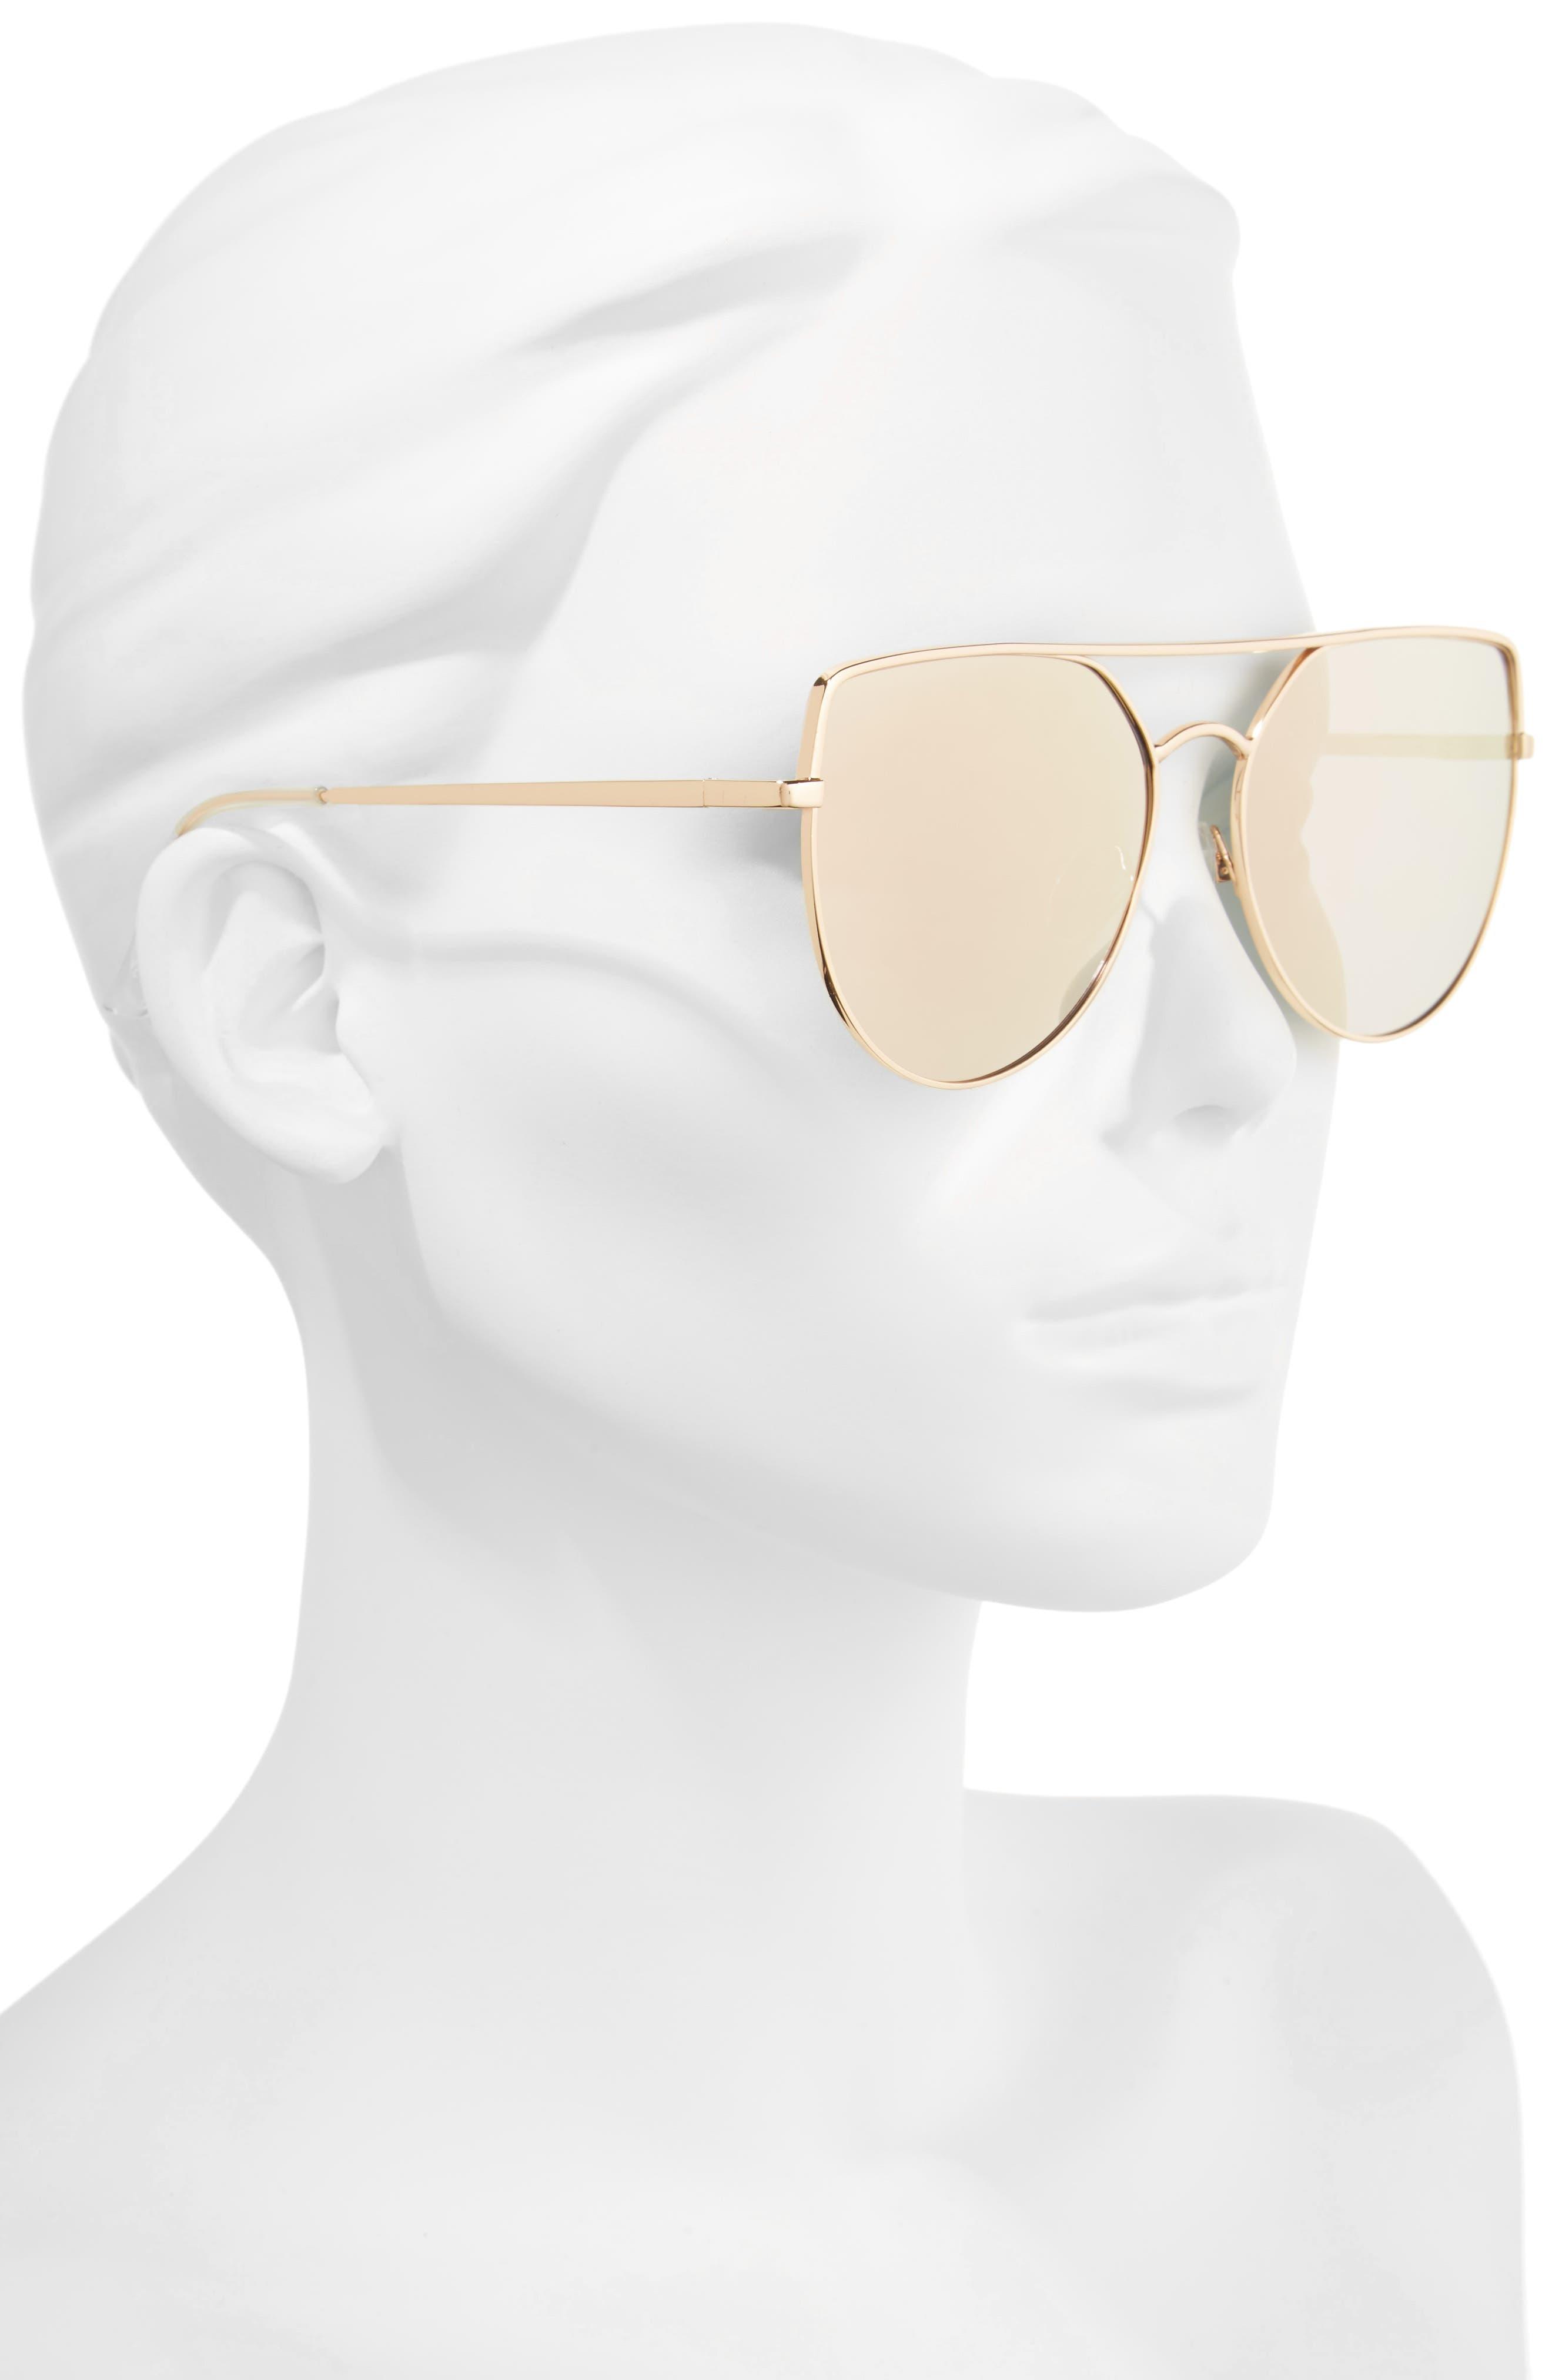 60mm Aviator Sunglasses,                             Alternate thumbnail 2, color,                             220